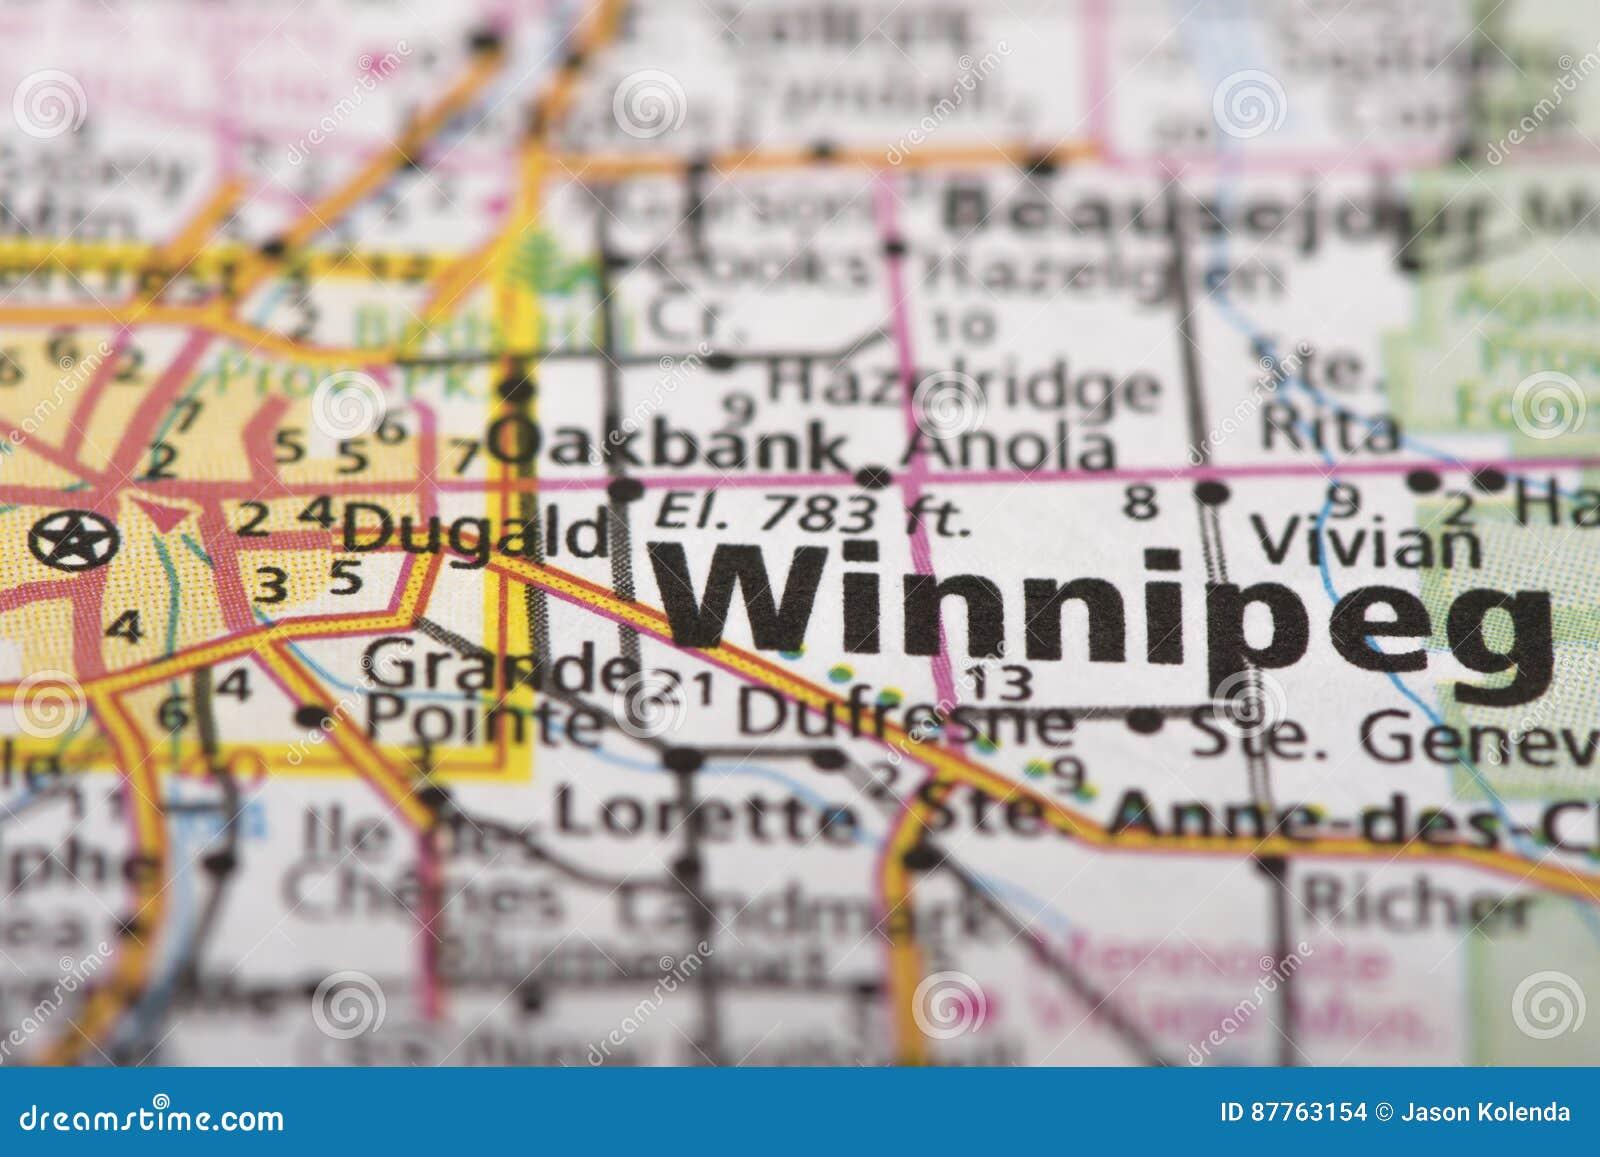 Winnipeg On Map Of Canada.Winnipeg Manitoba On Map Stock Photo Image Of Destination 87763154